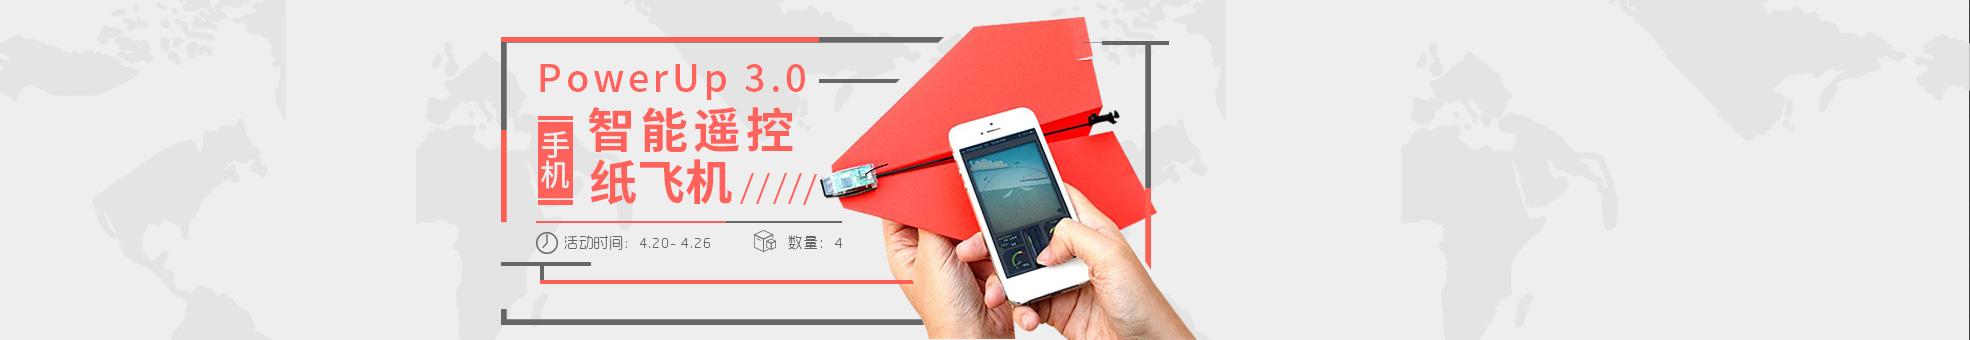 powerup 3.0 手机智能遥控纸飞机